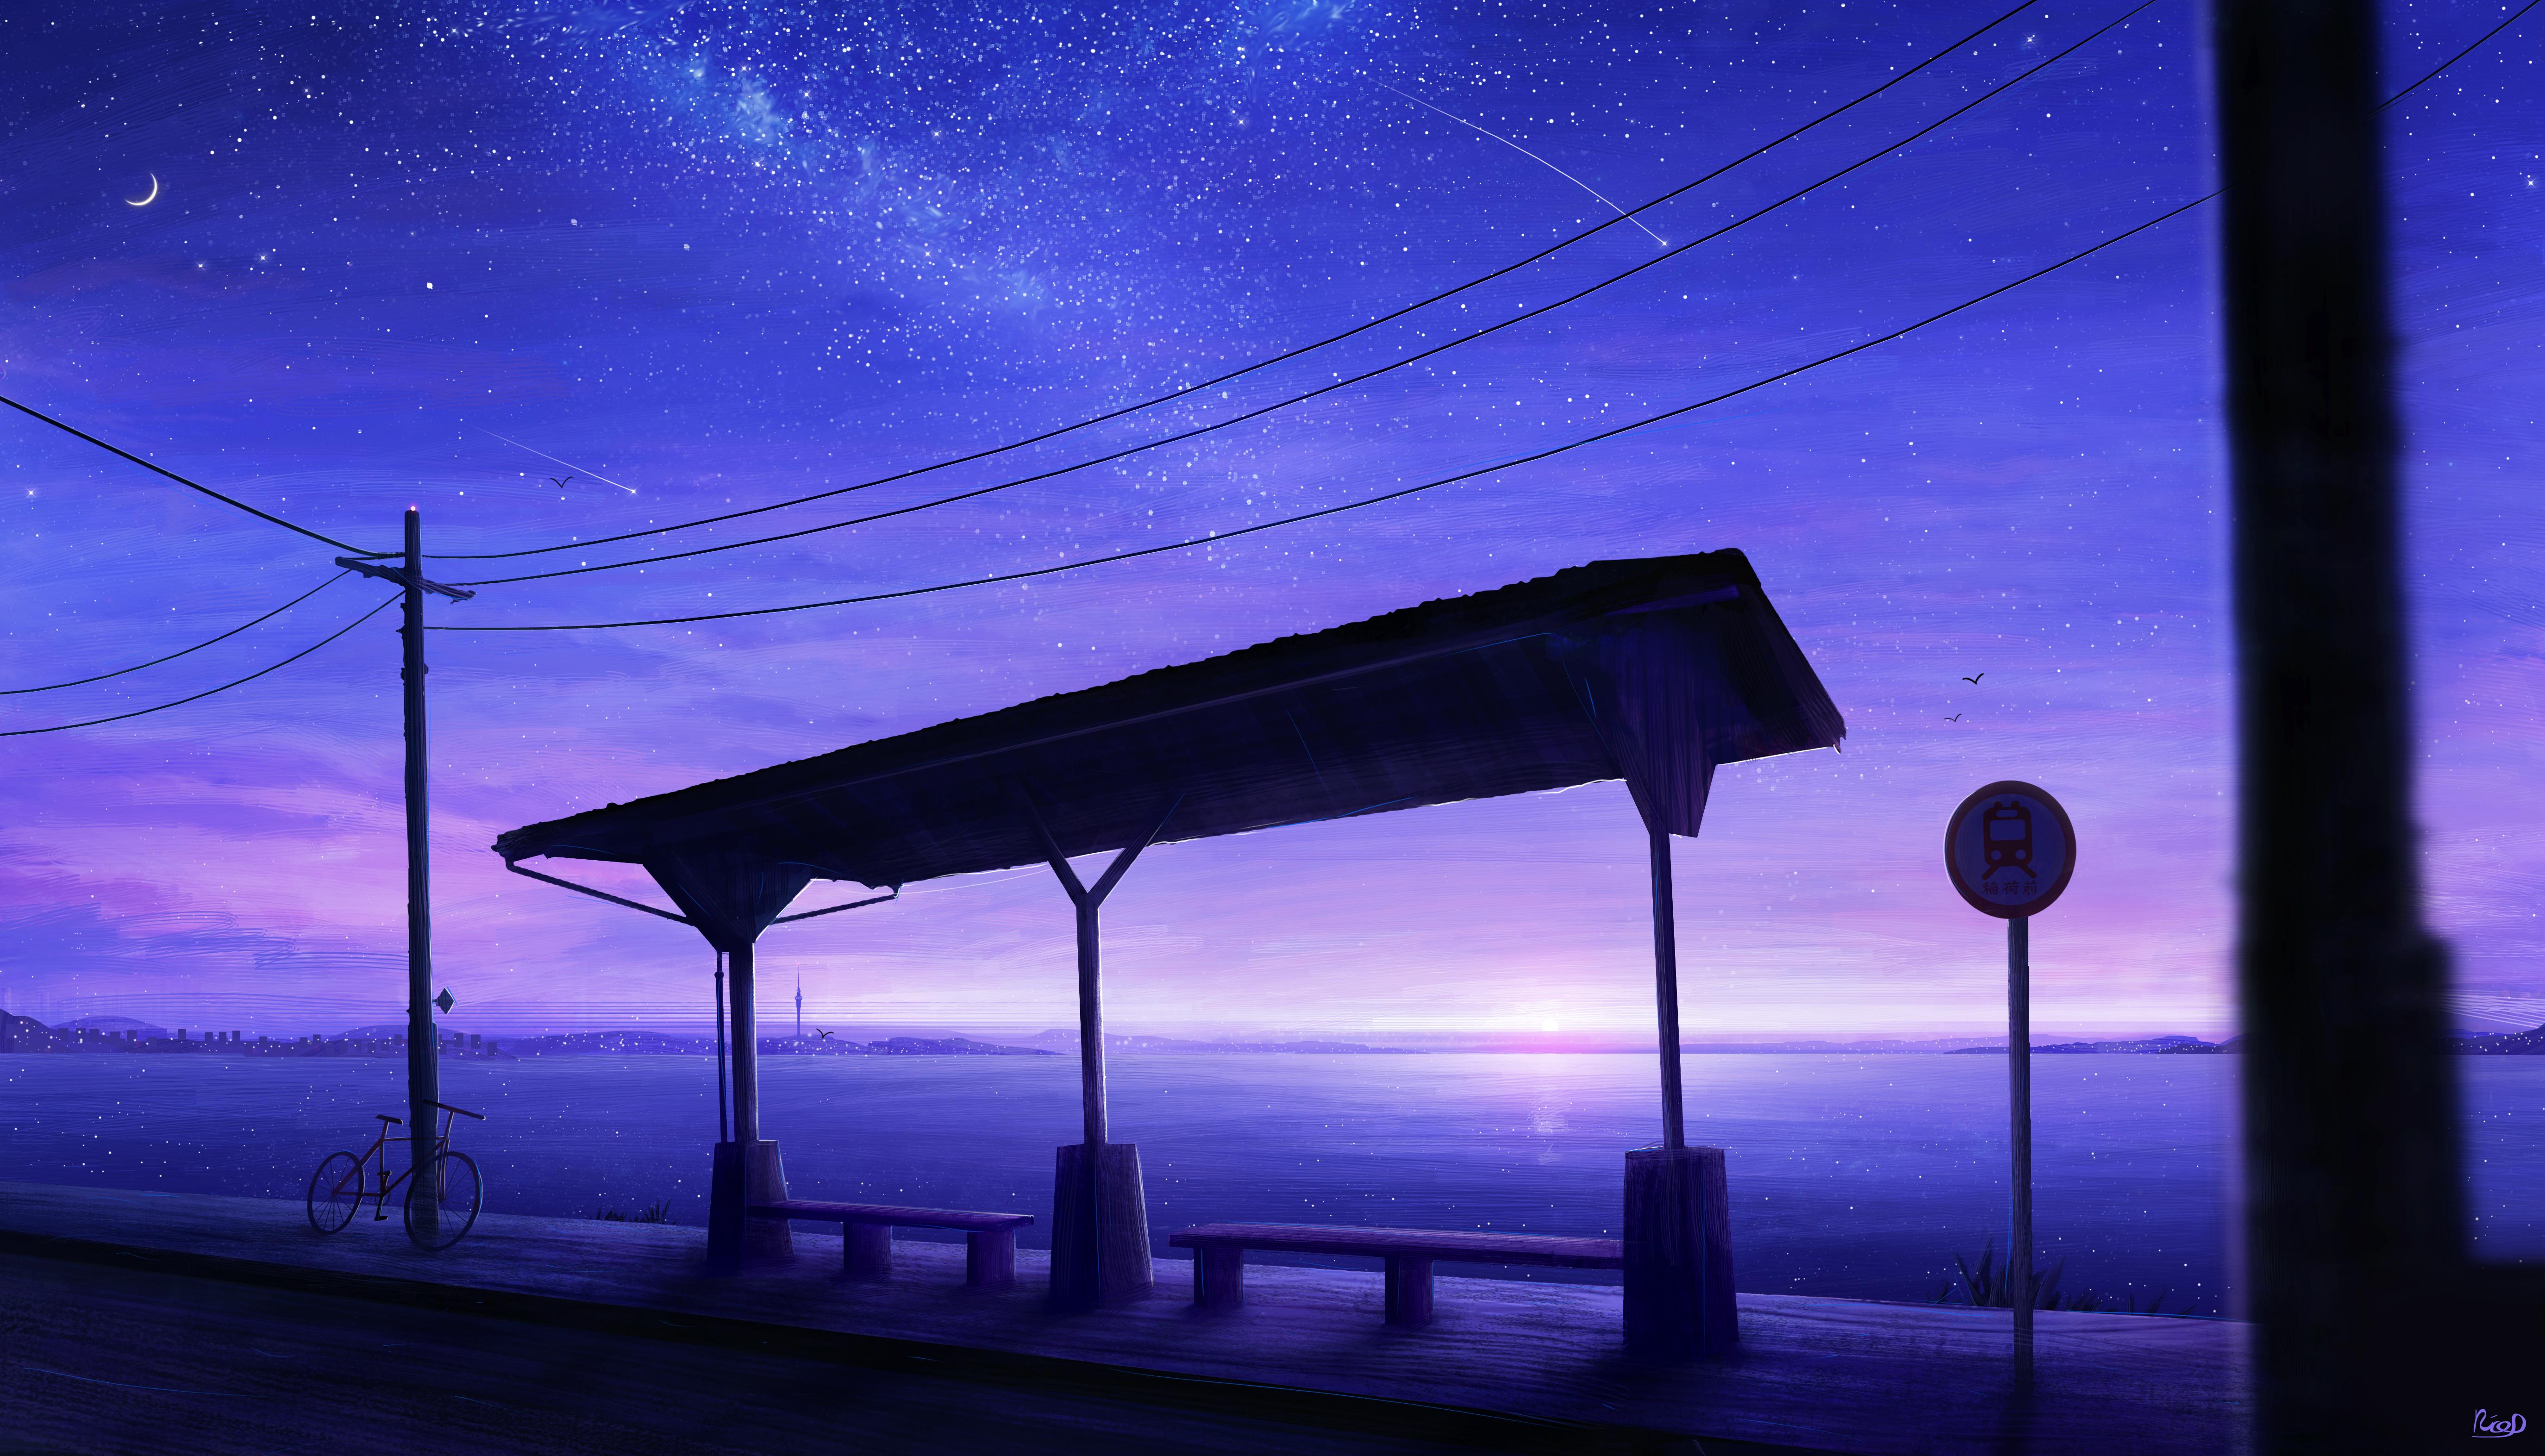 General 5497x3145 RicoDZ stars bus stop shooting stars power lines bicycle sea sunset digital art bench